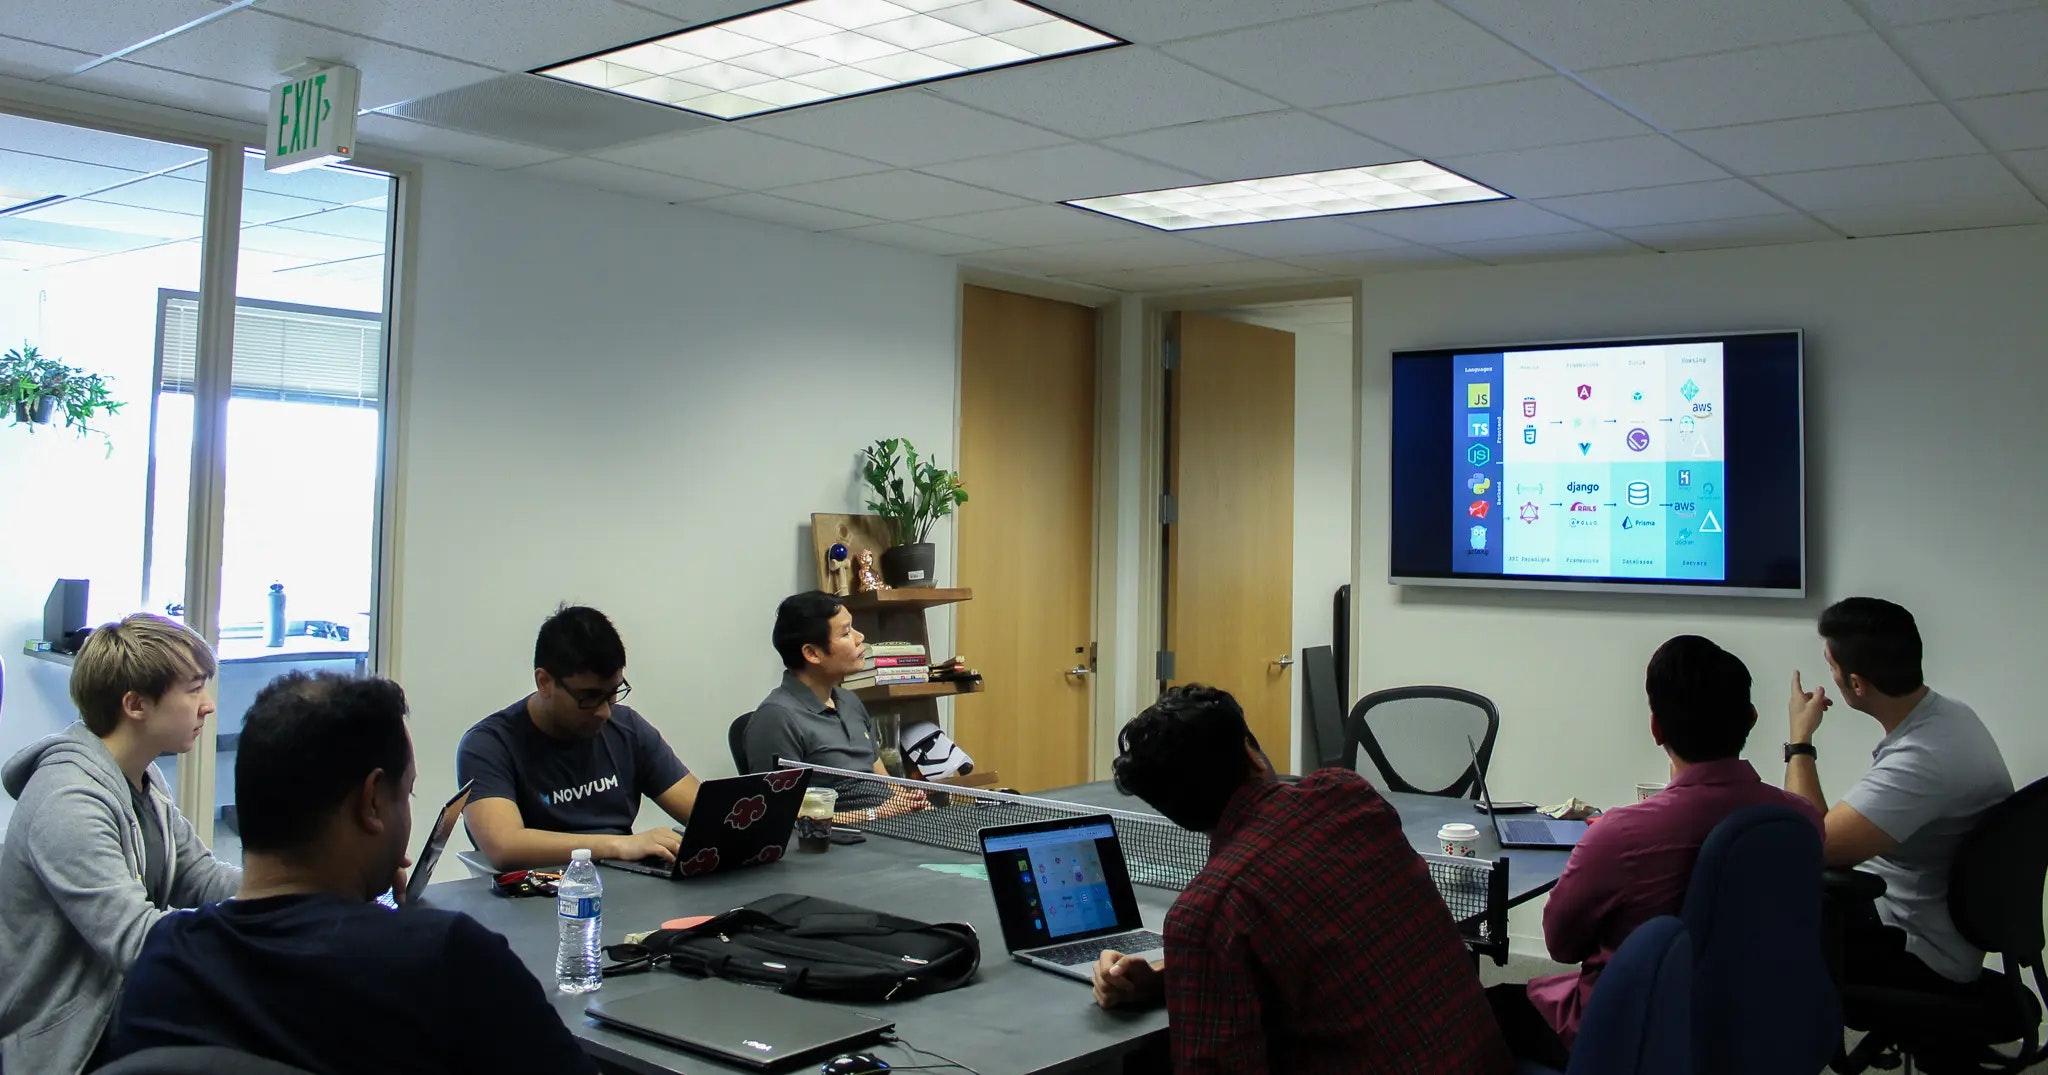 #FullStackRecap: Building a Tech Community in Orange County